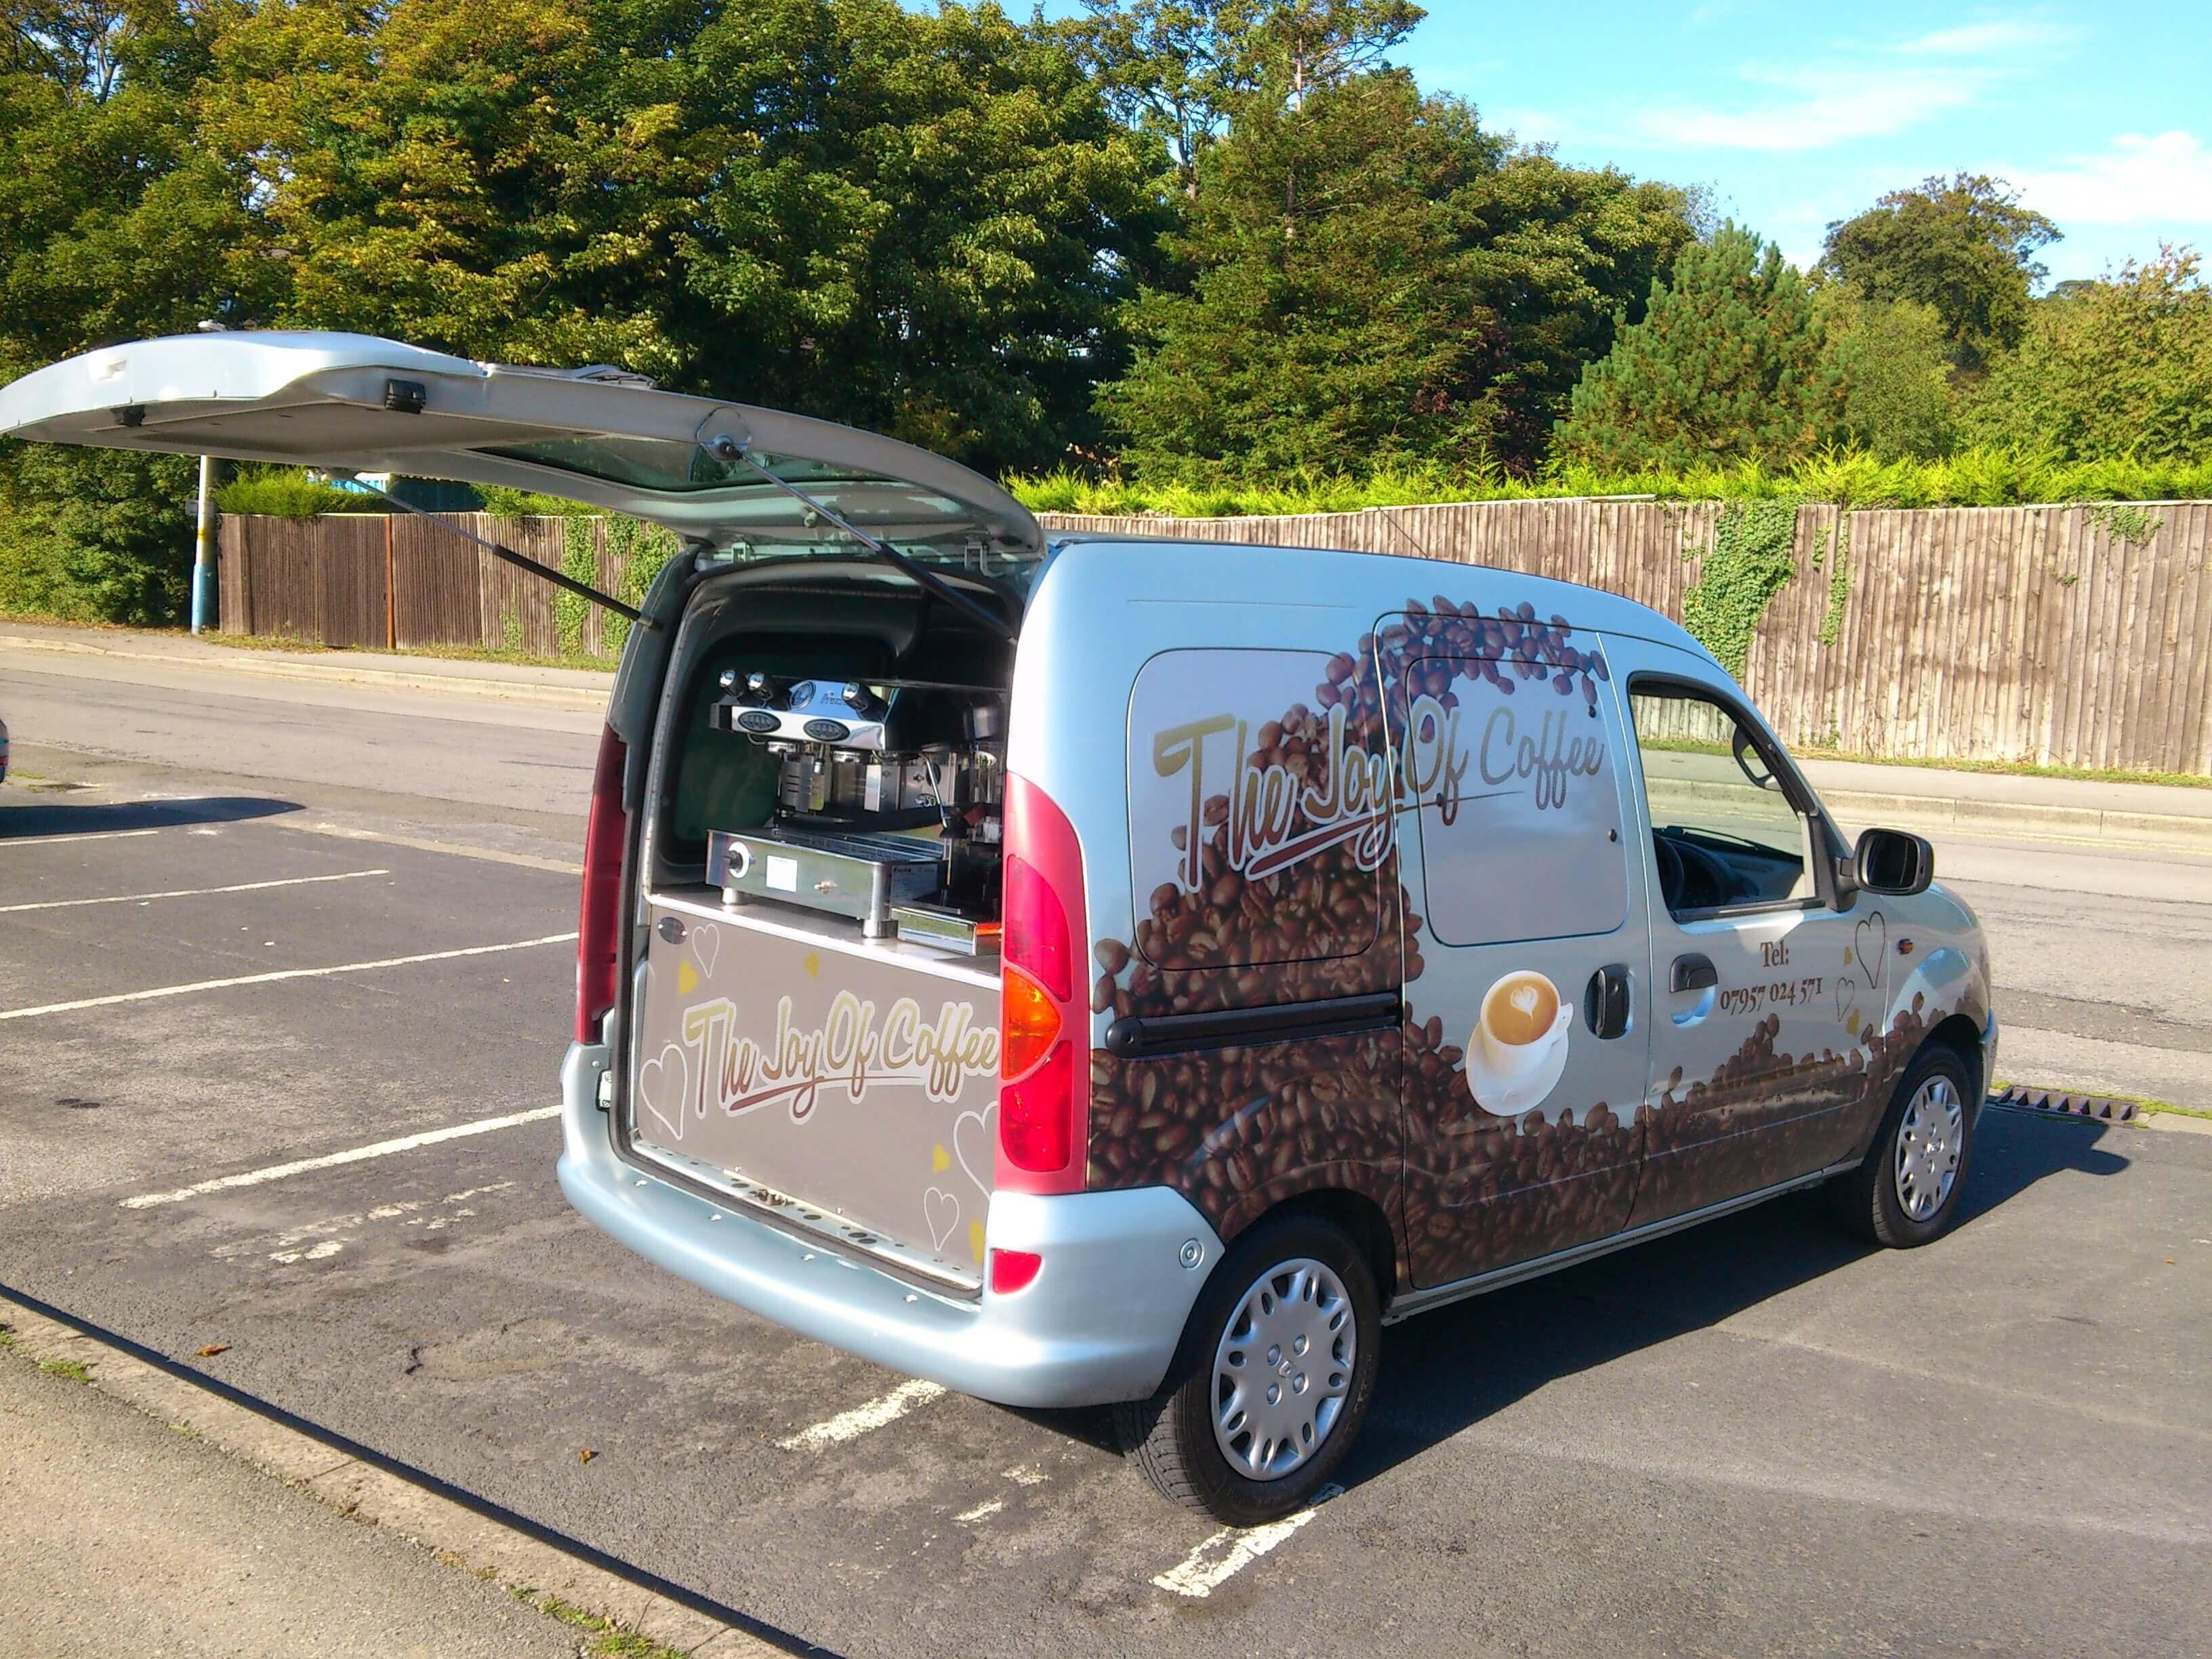 Renault Kangoo Coffee Conversion